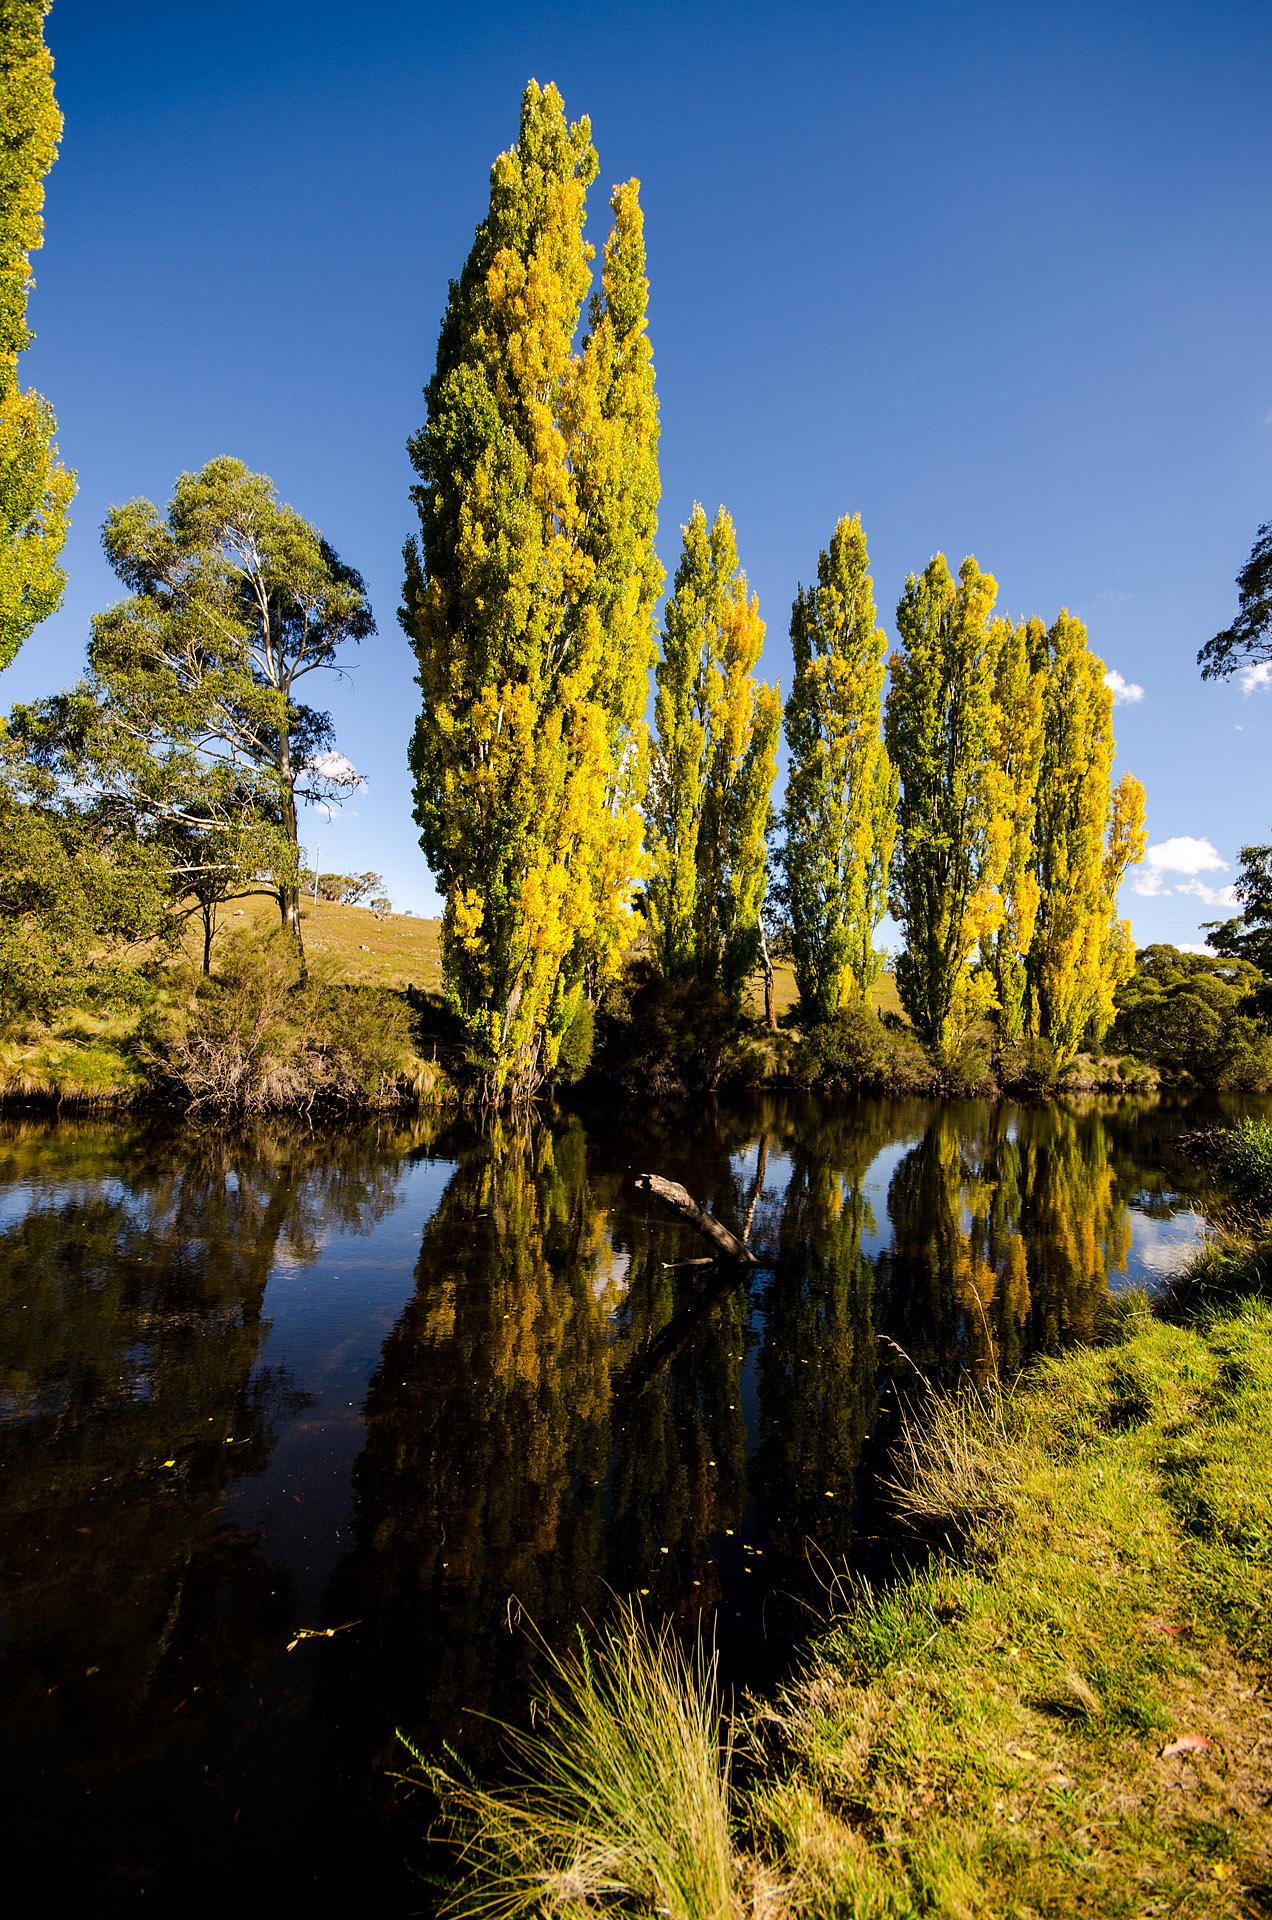 Poplars over the Thredbo River